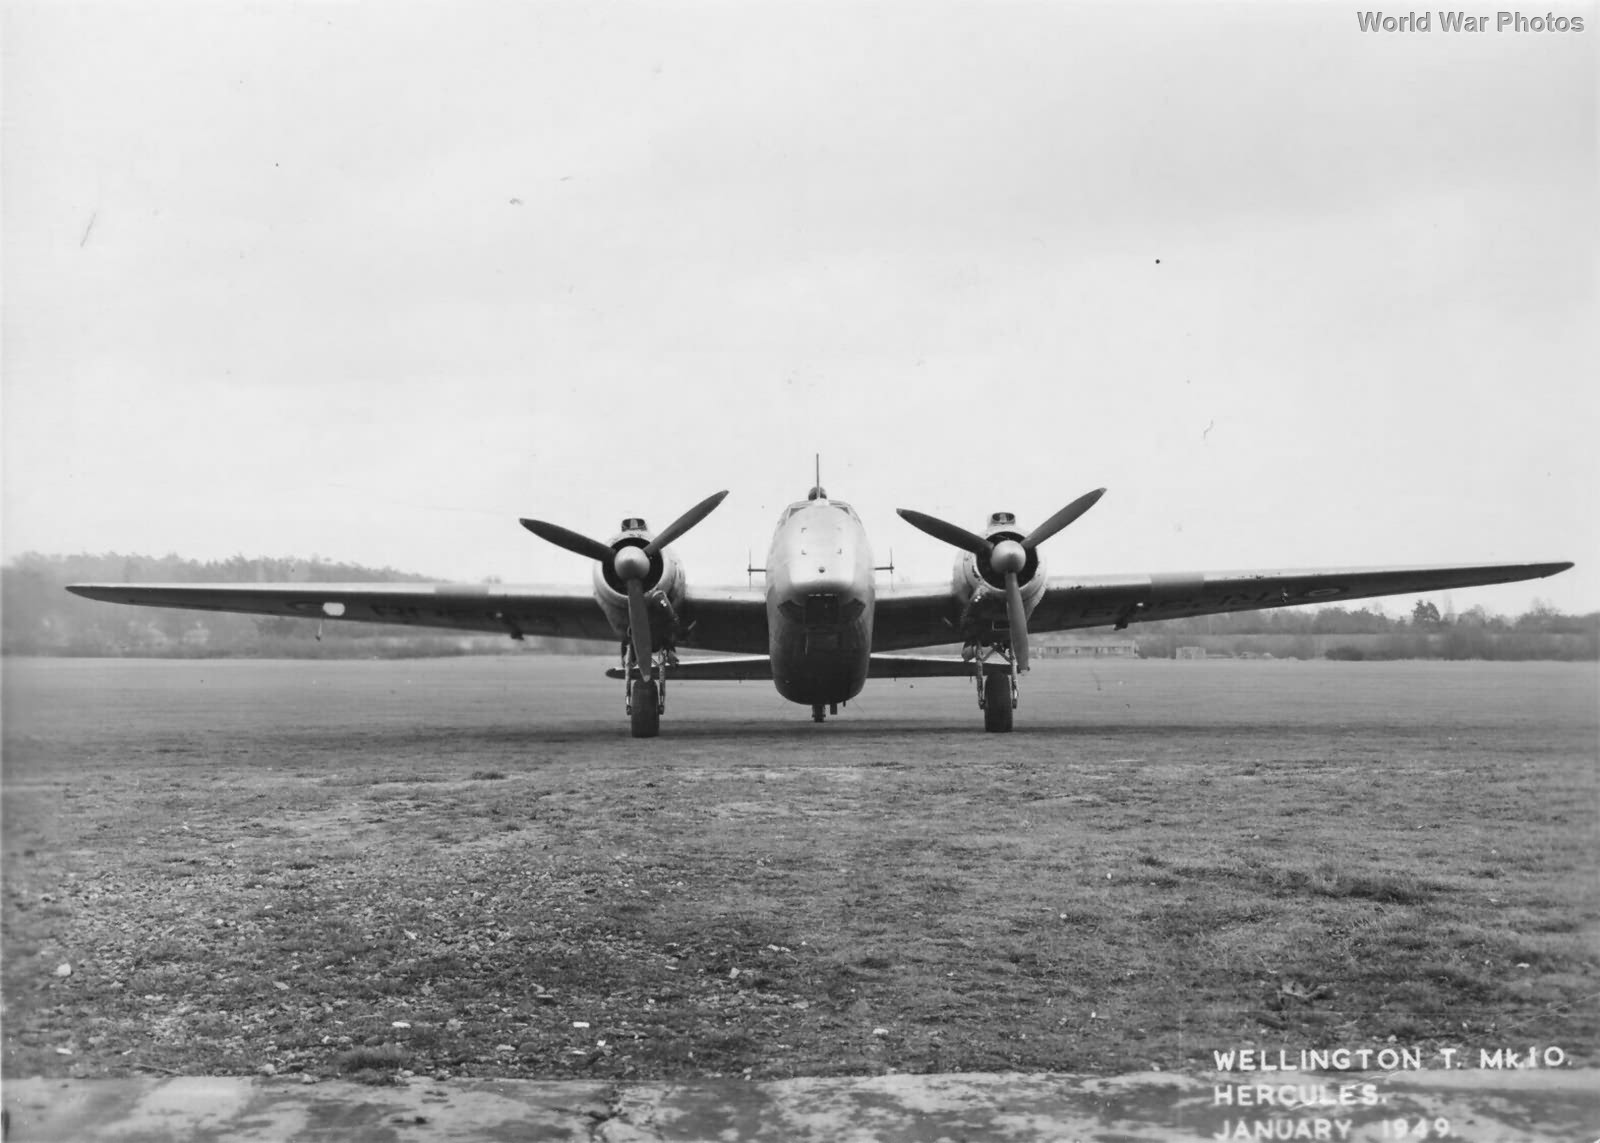 Trainer Wellington T Mk 10 NA928 1949